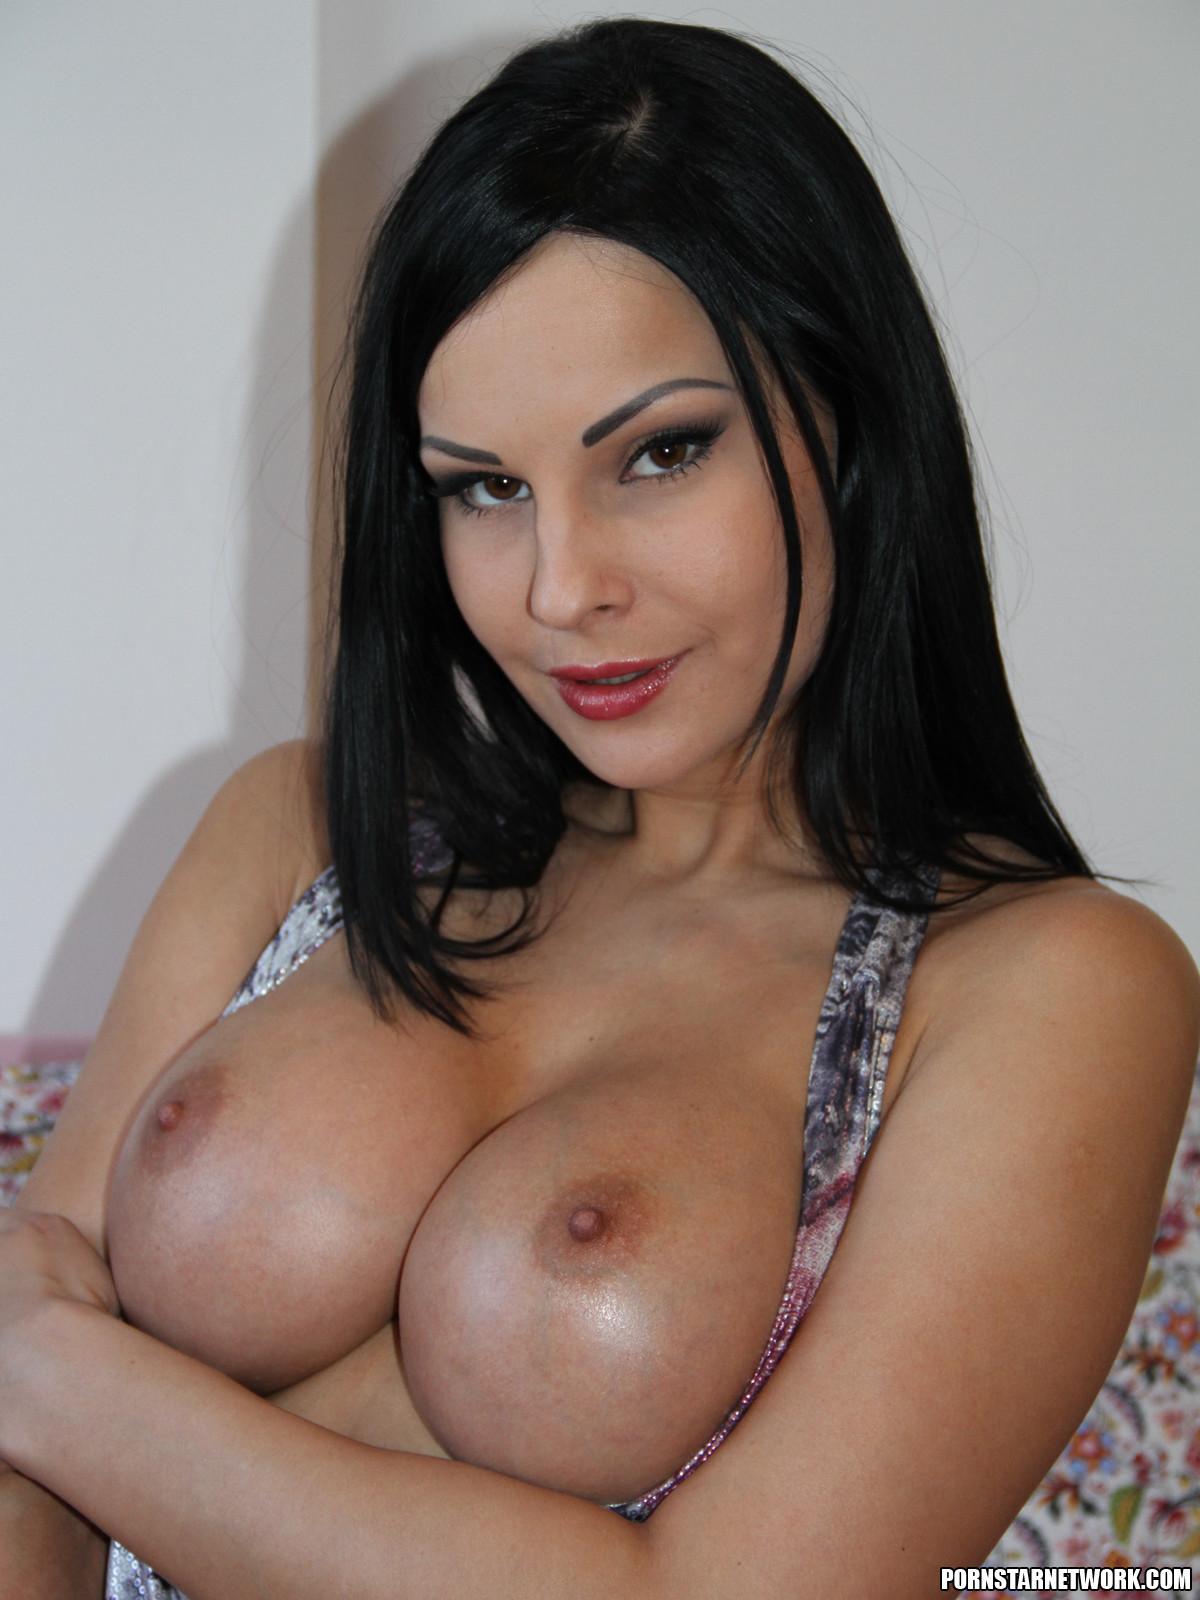 Jessa and milf suck juicy cock together 4